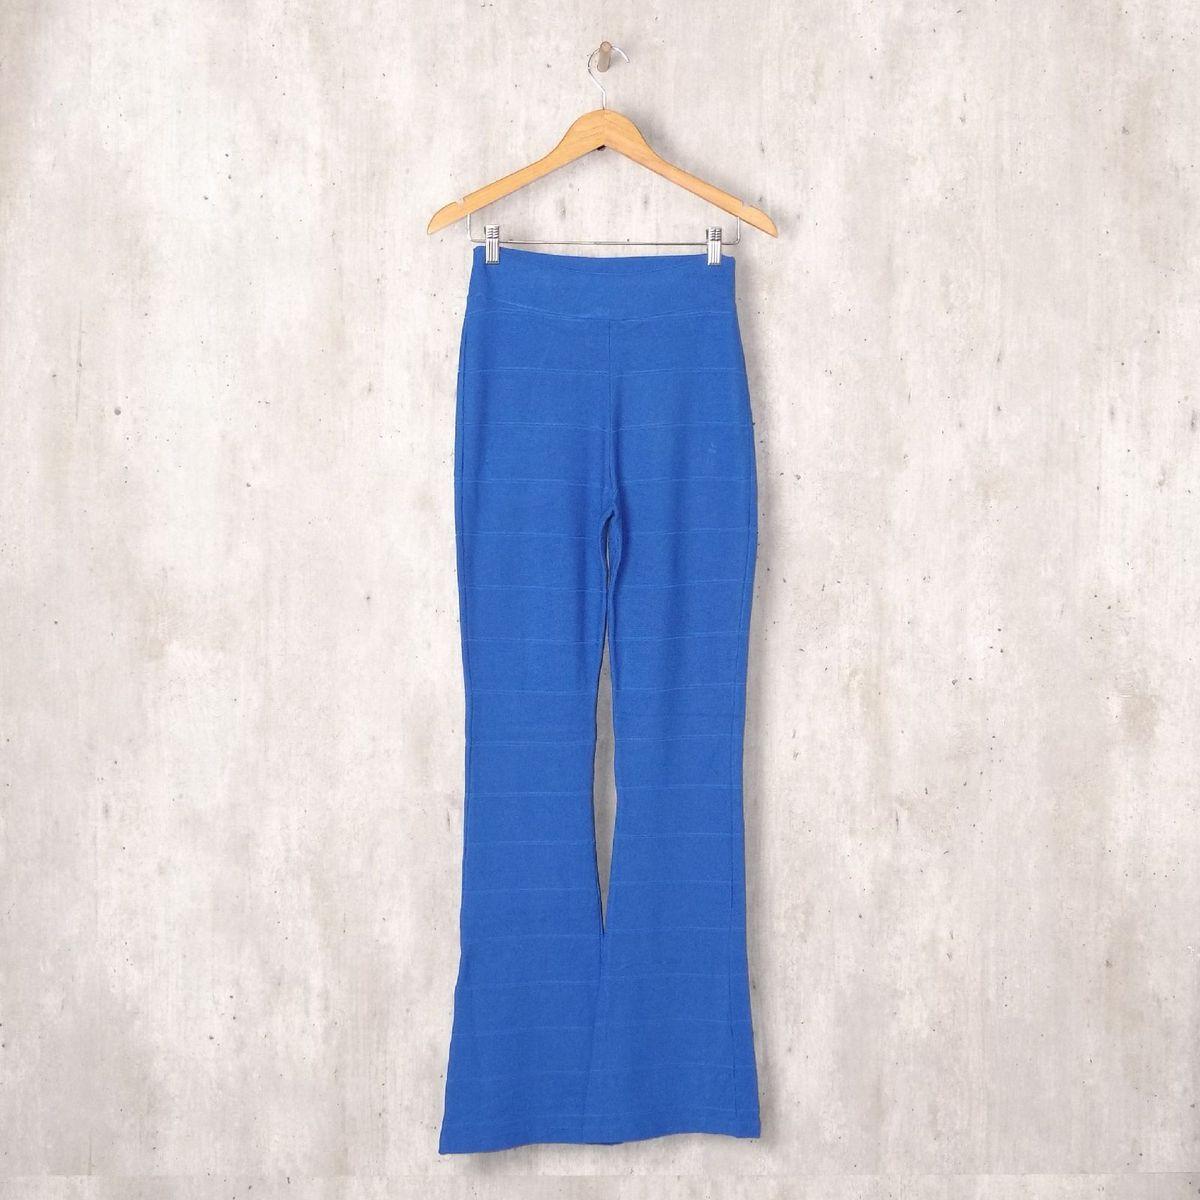 70851b4974c2 Calça Flare Azul | Calça Feminina Moda Feminina Sob Medida Usado 33458639 |  enjoei